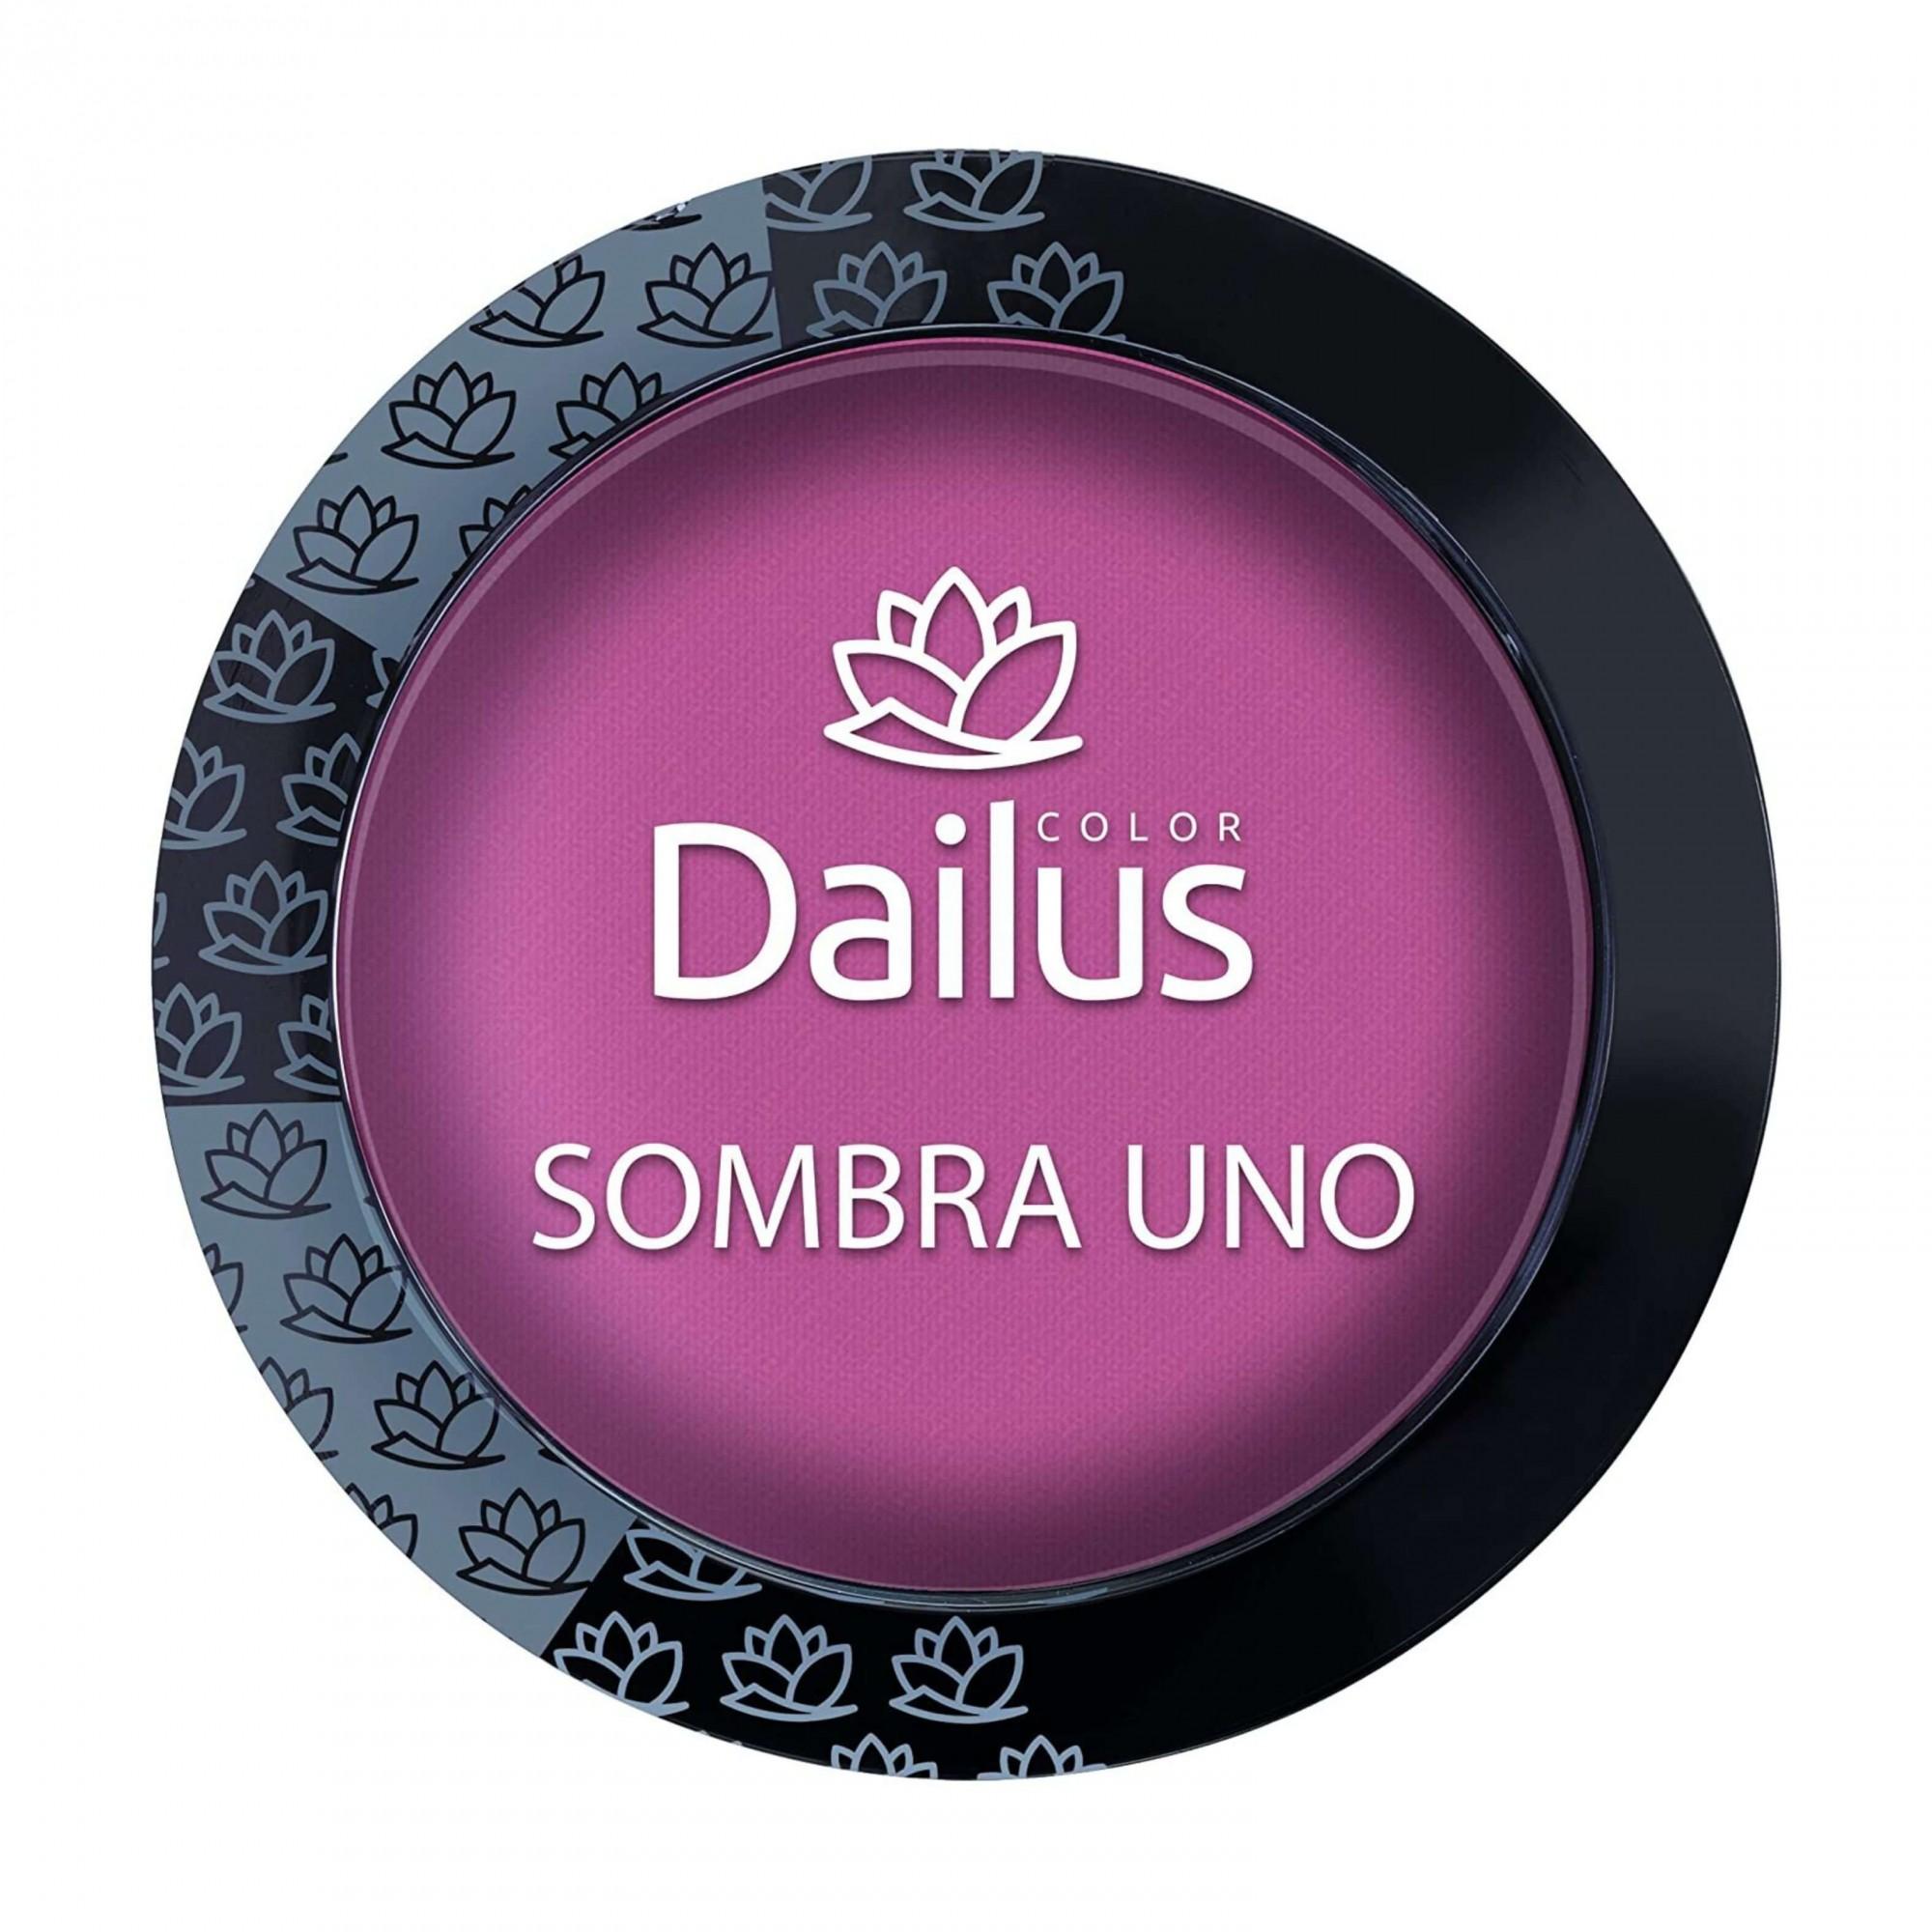 Sombra Uno Dailus 06